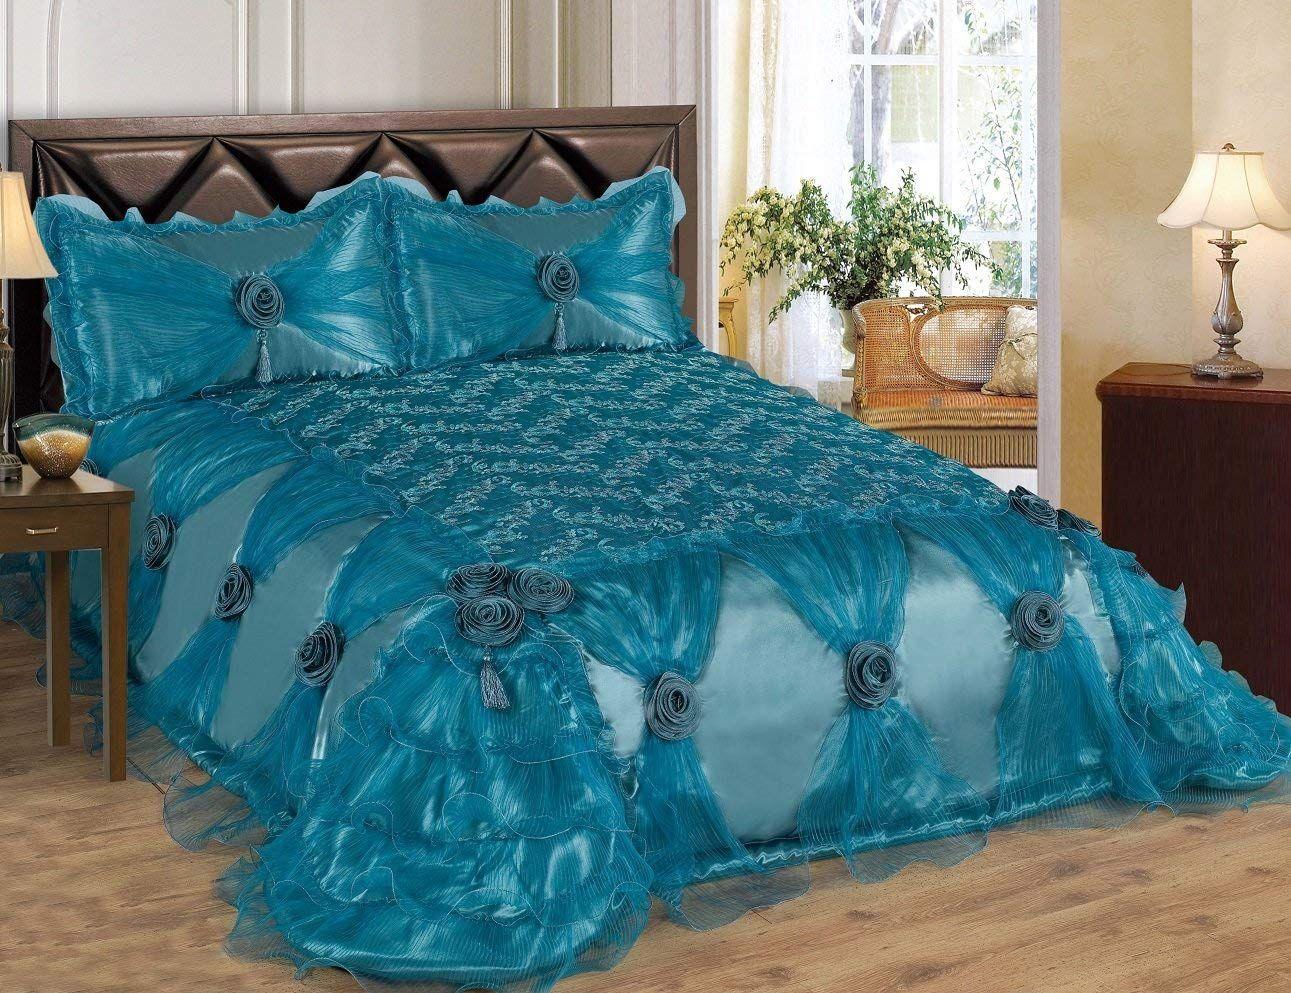 3 Piece Real 3D Comforter Set Bedspread Flower